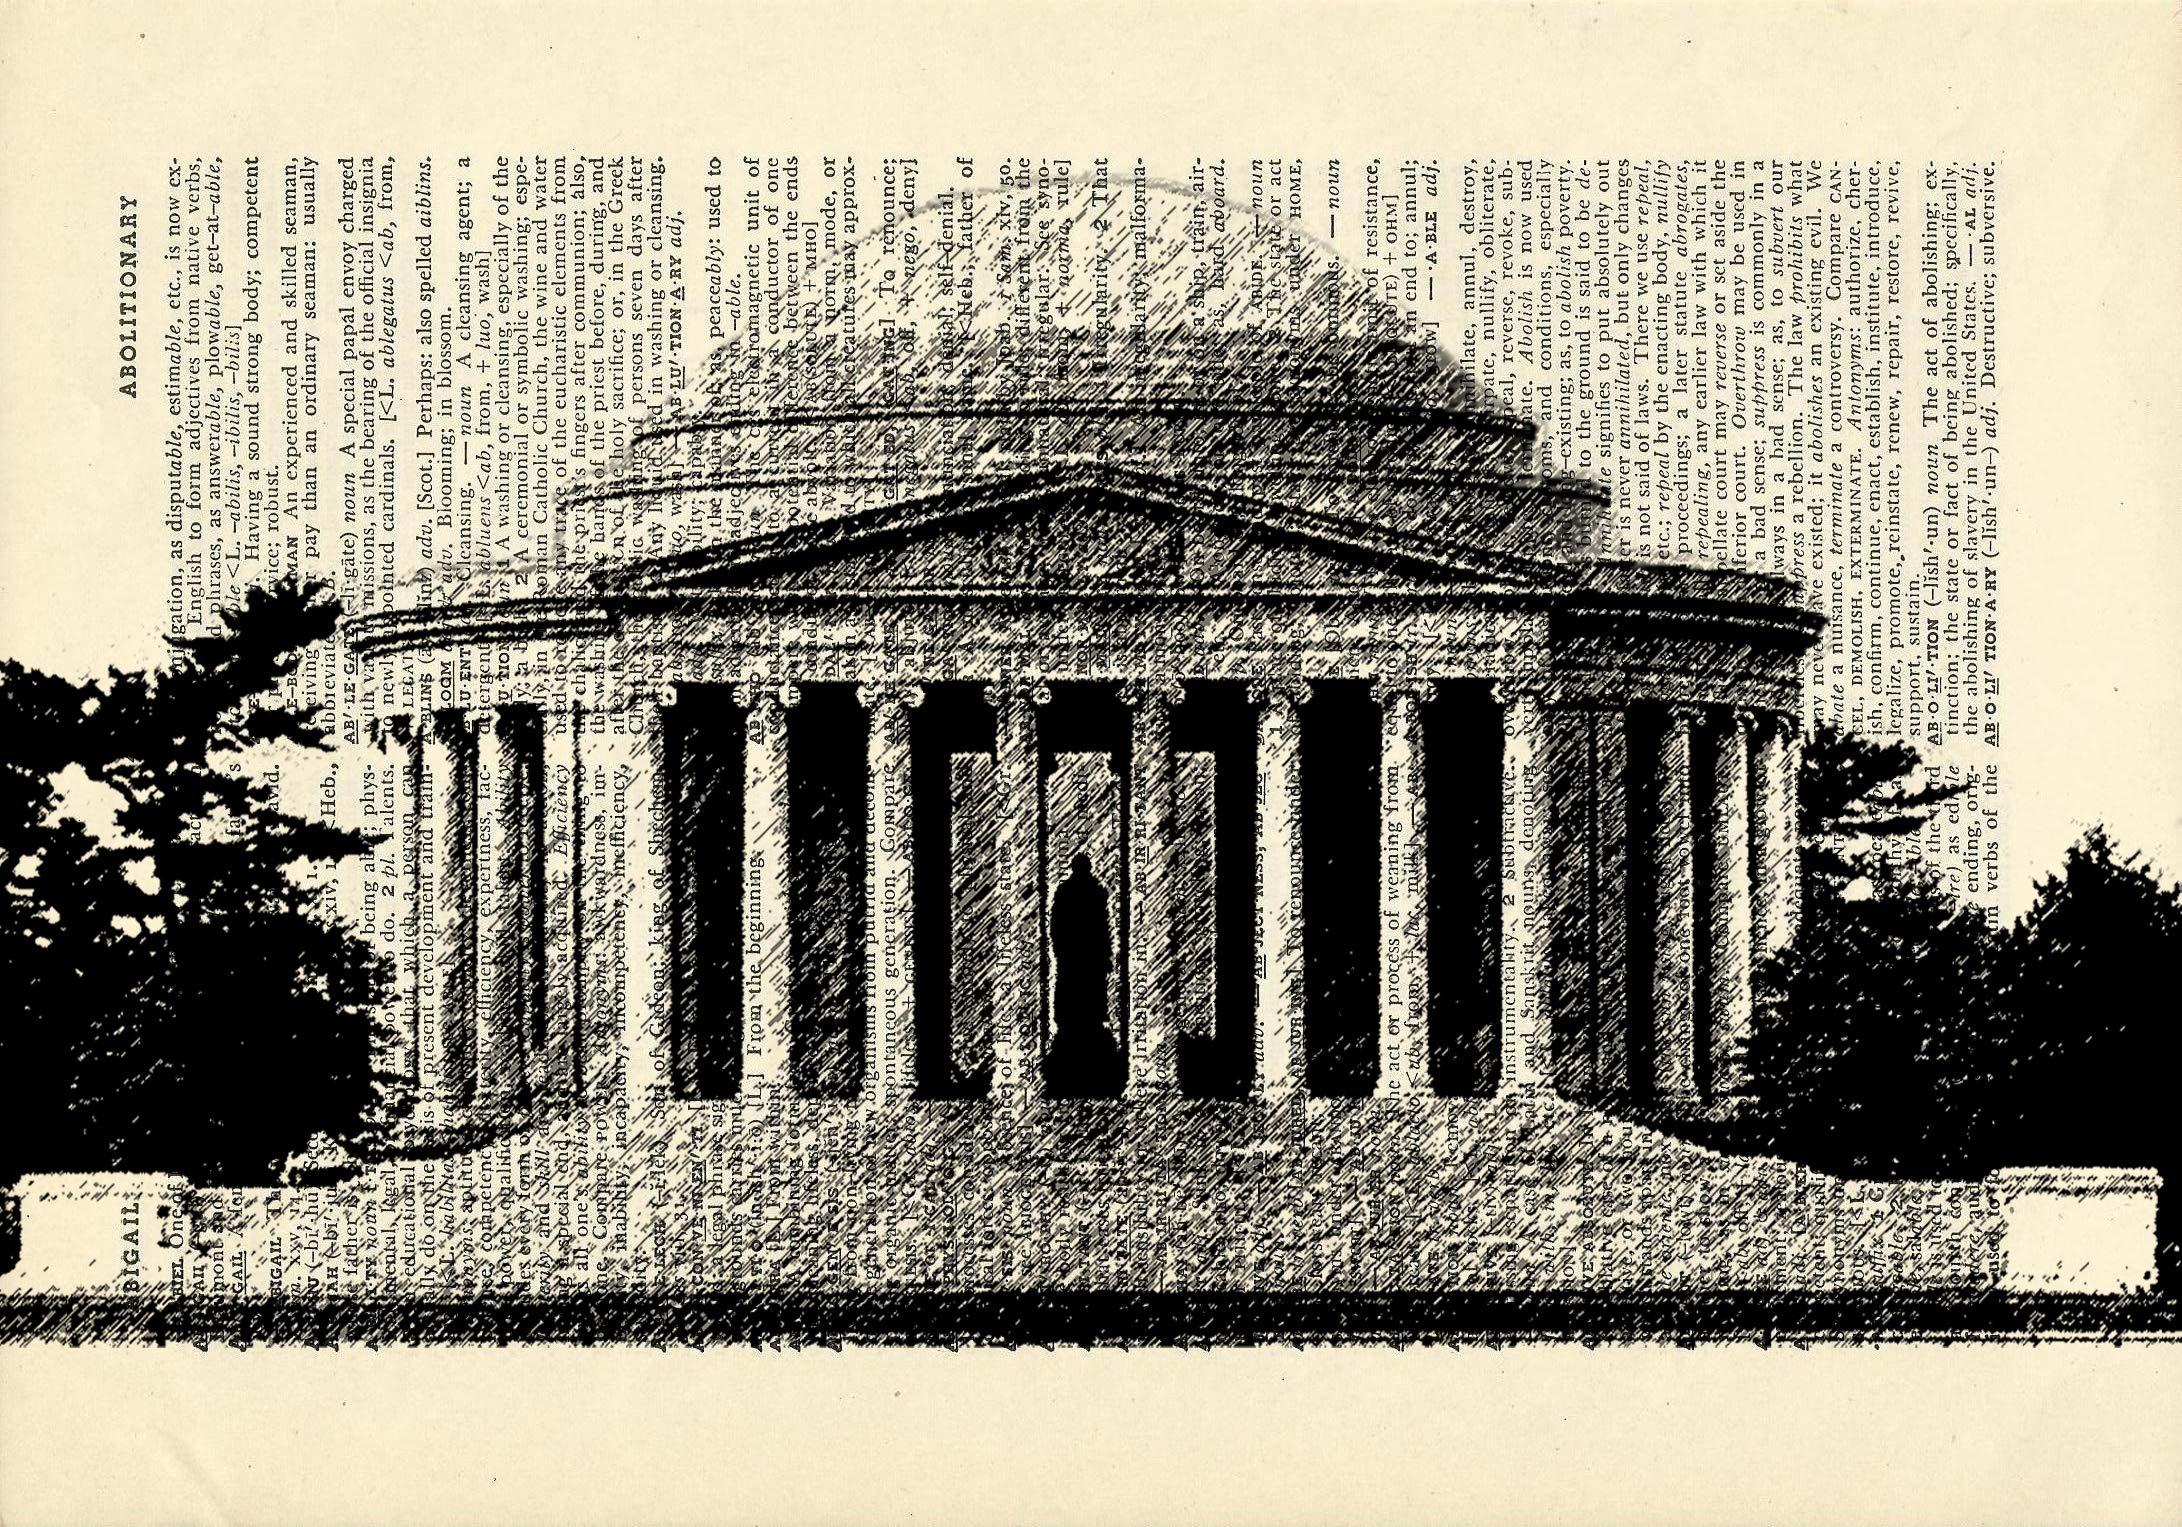 Jefferson Memorial Washington DC Printed on Dictionary Paper